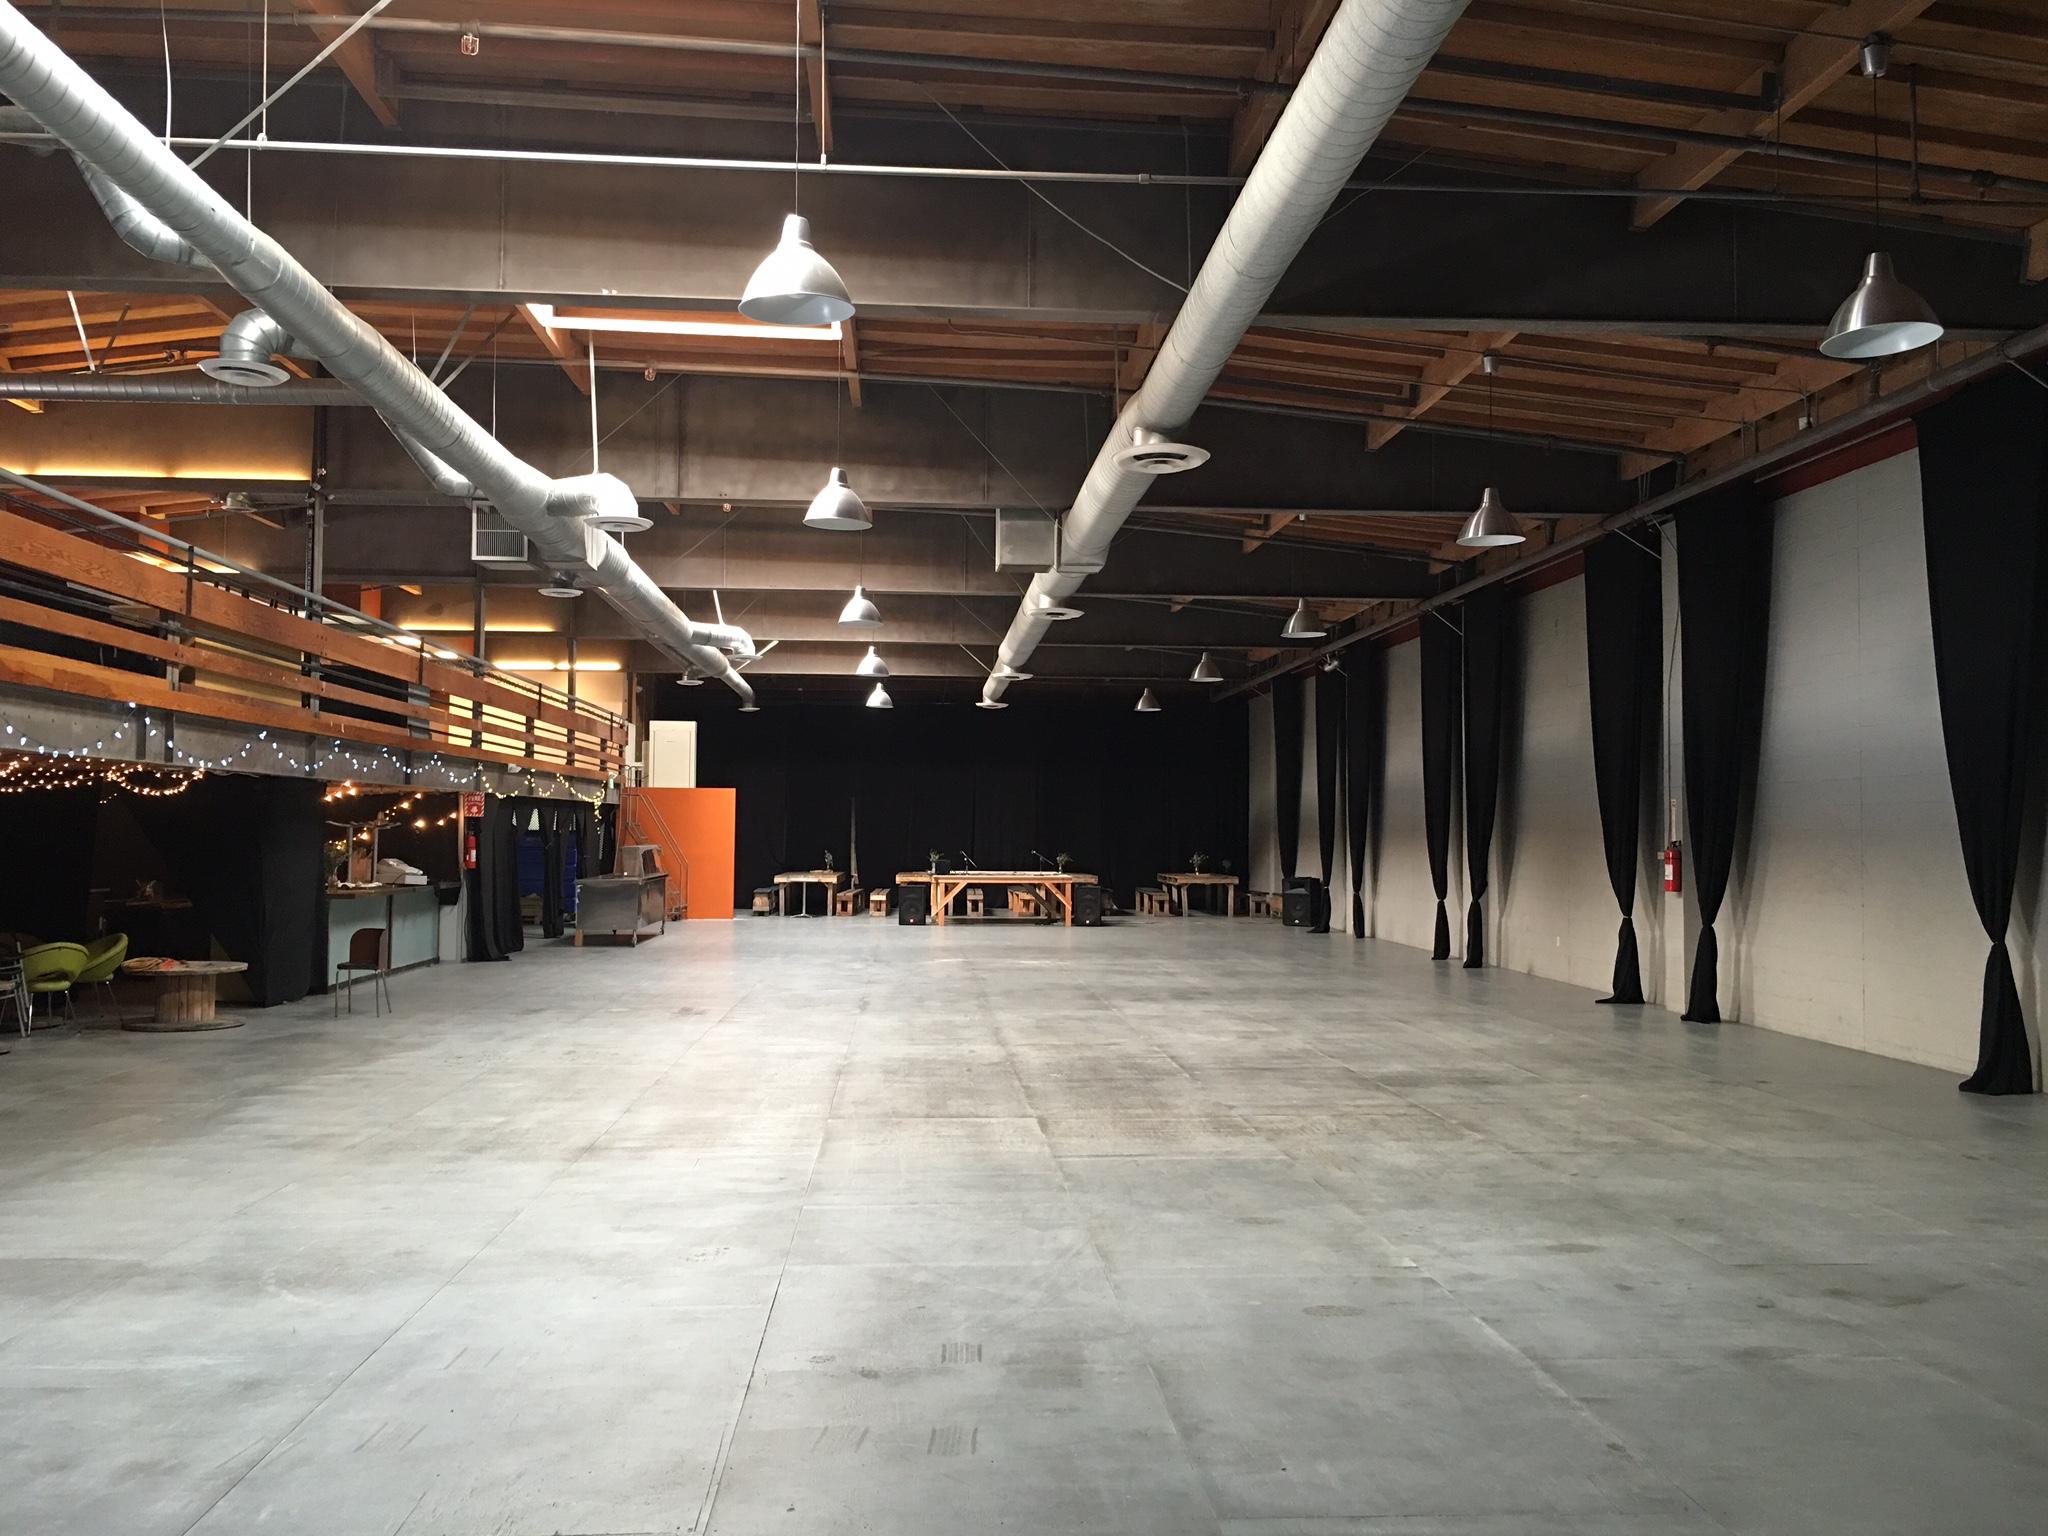 westside market — westside museum